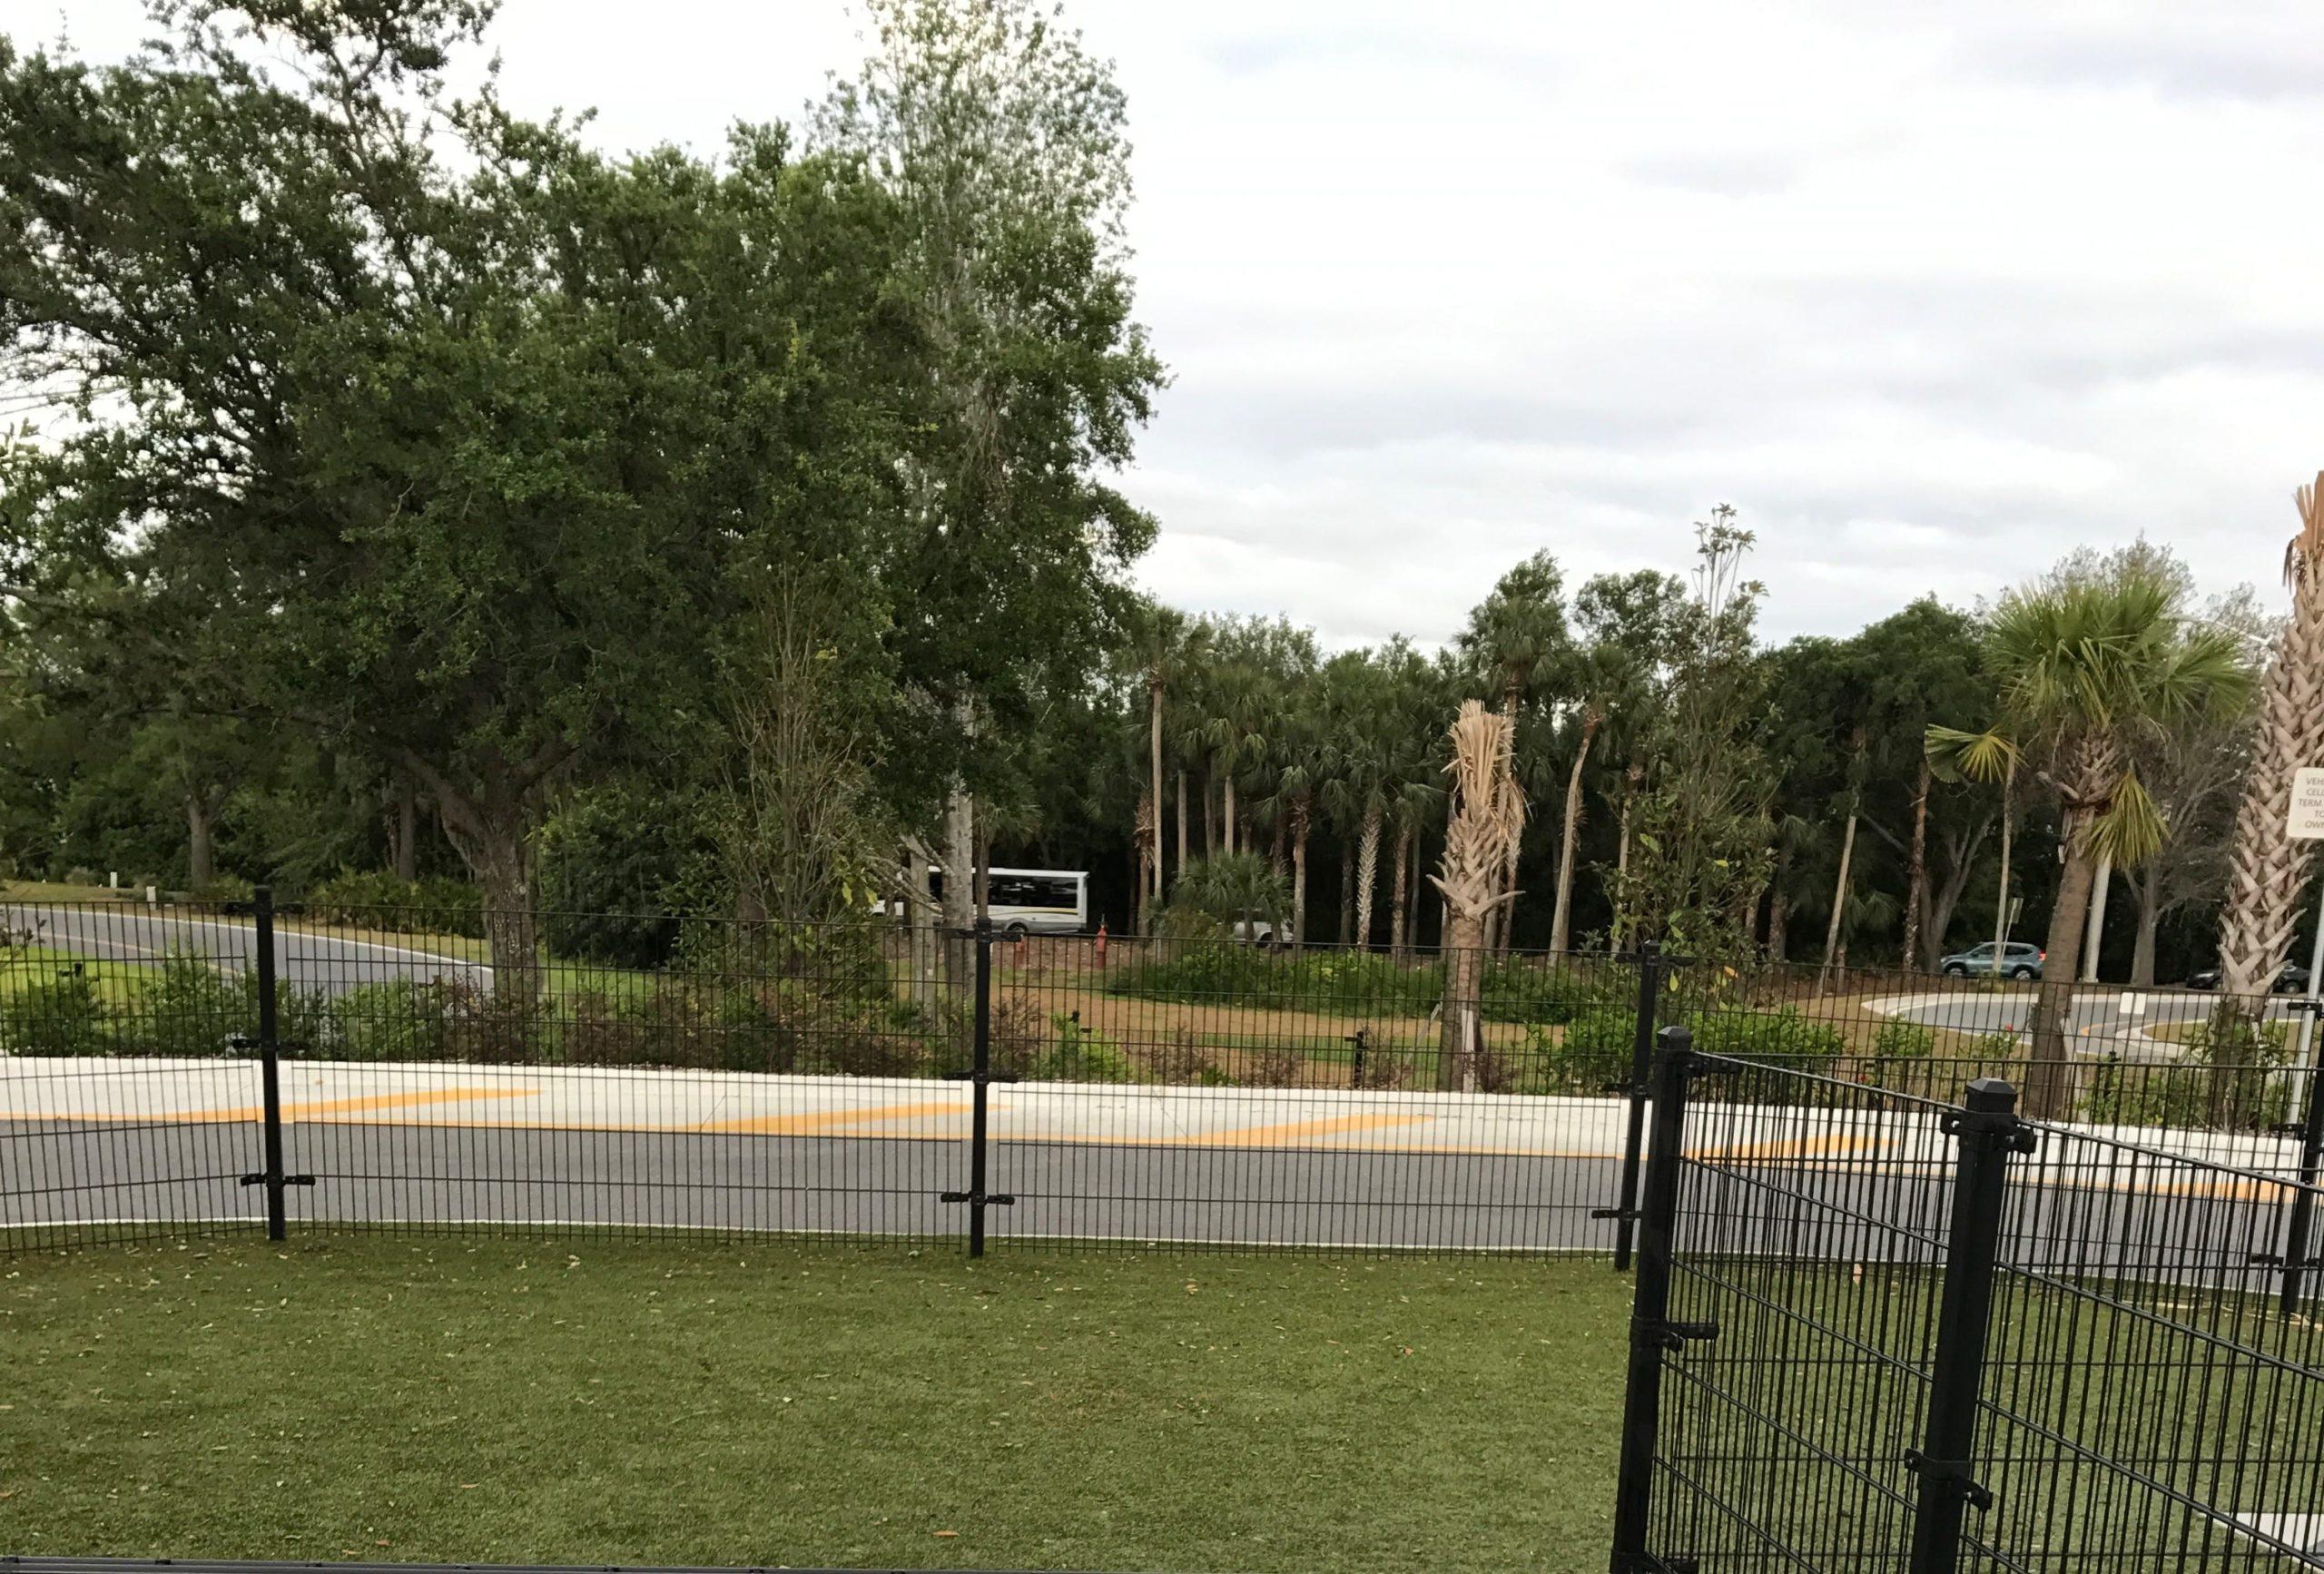 Orlando International Airport Dog Park with K9Grass